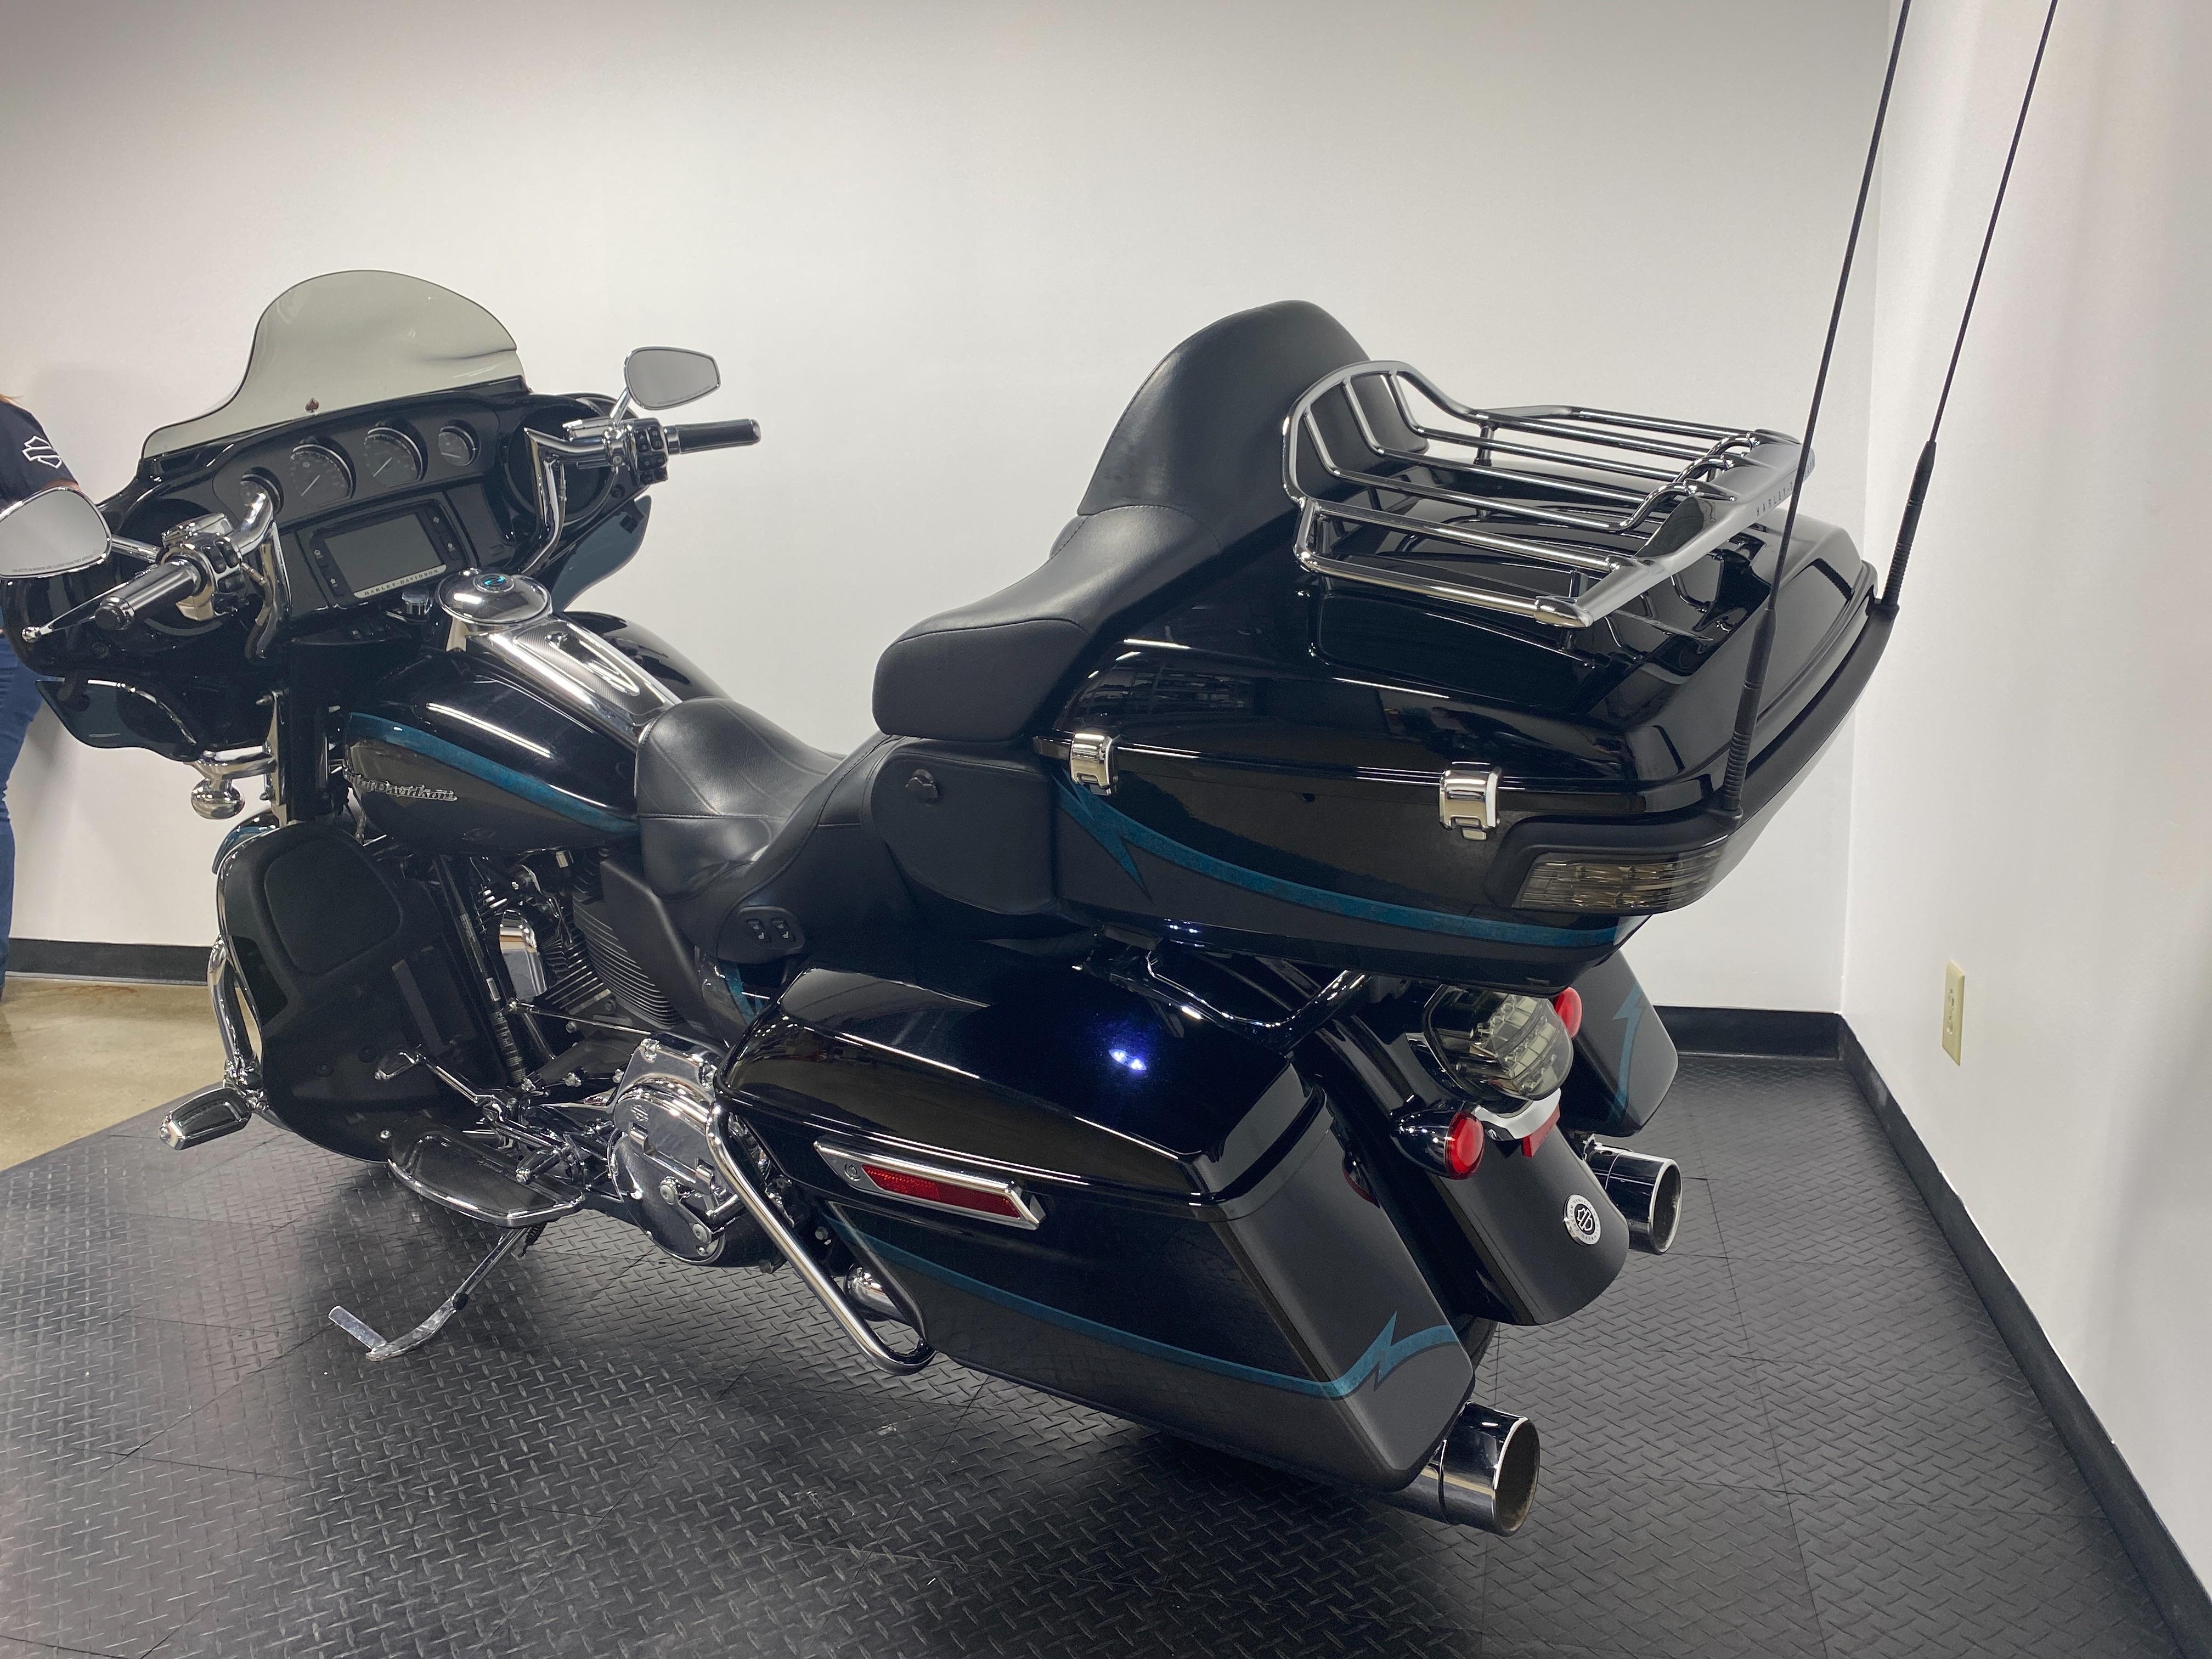 2015 Harley-Davidson Electra Glide CVO Limited at Cannonball Harley-Davidson